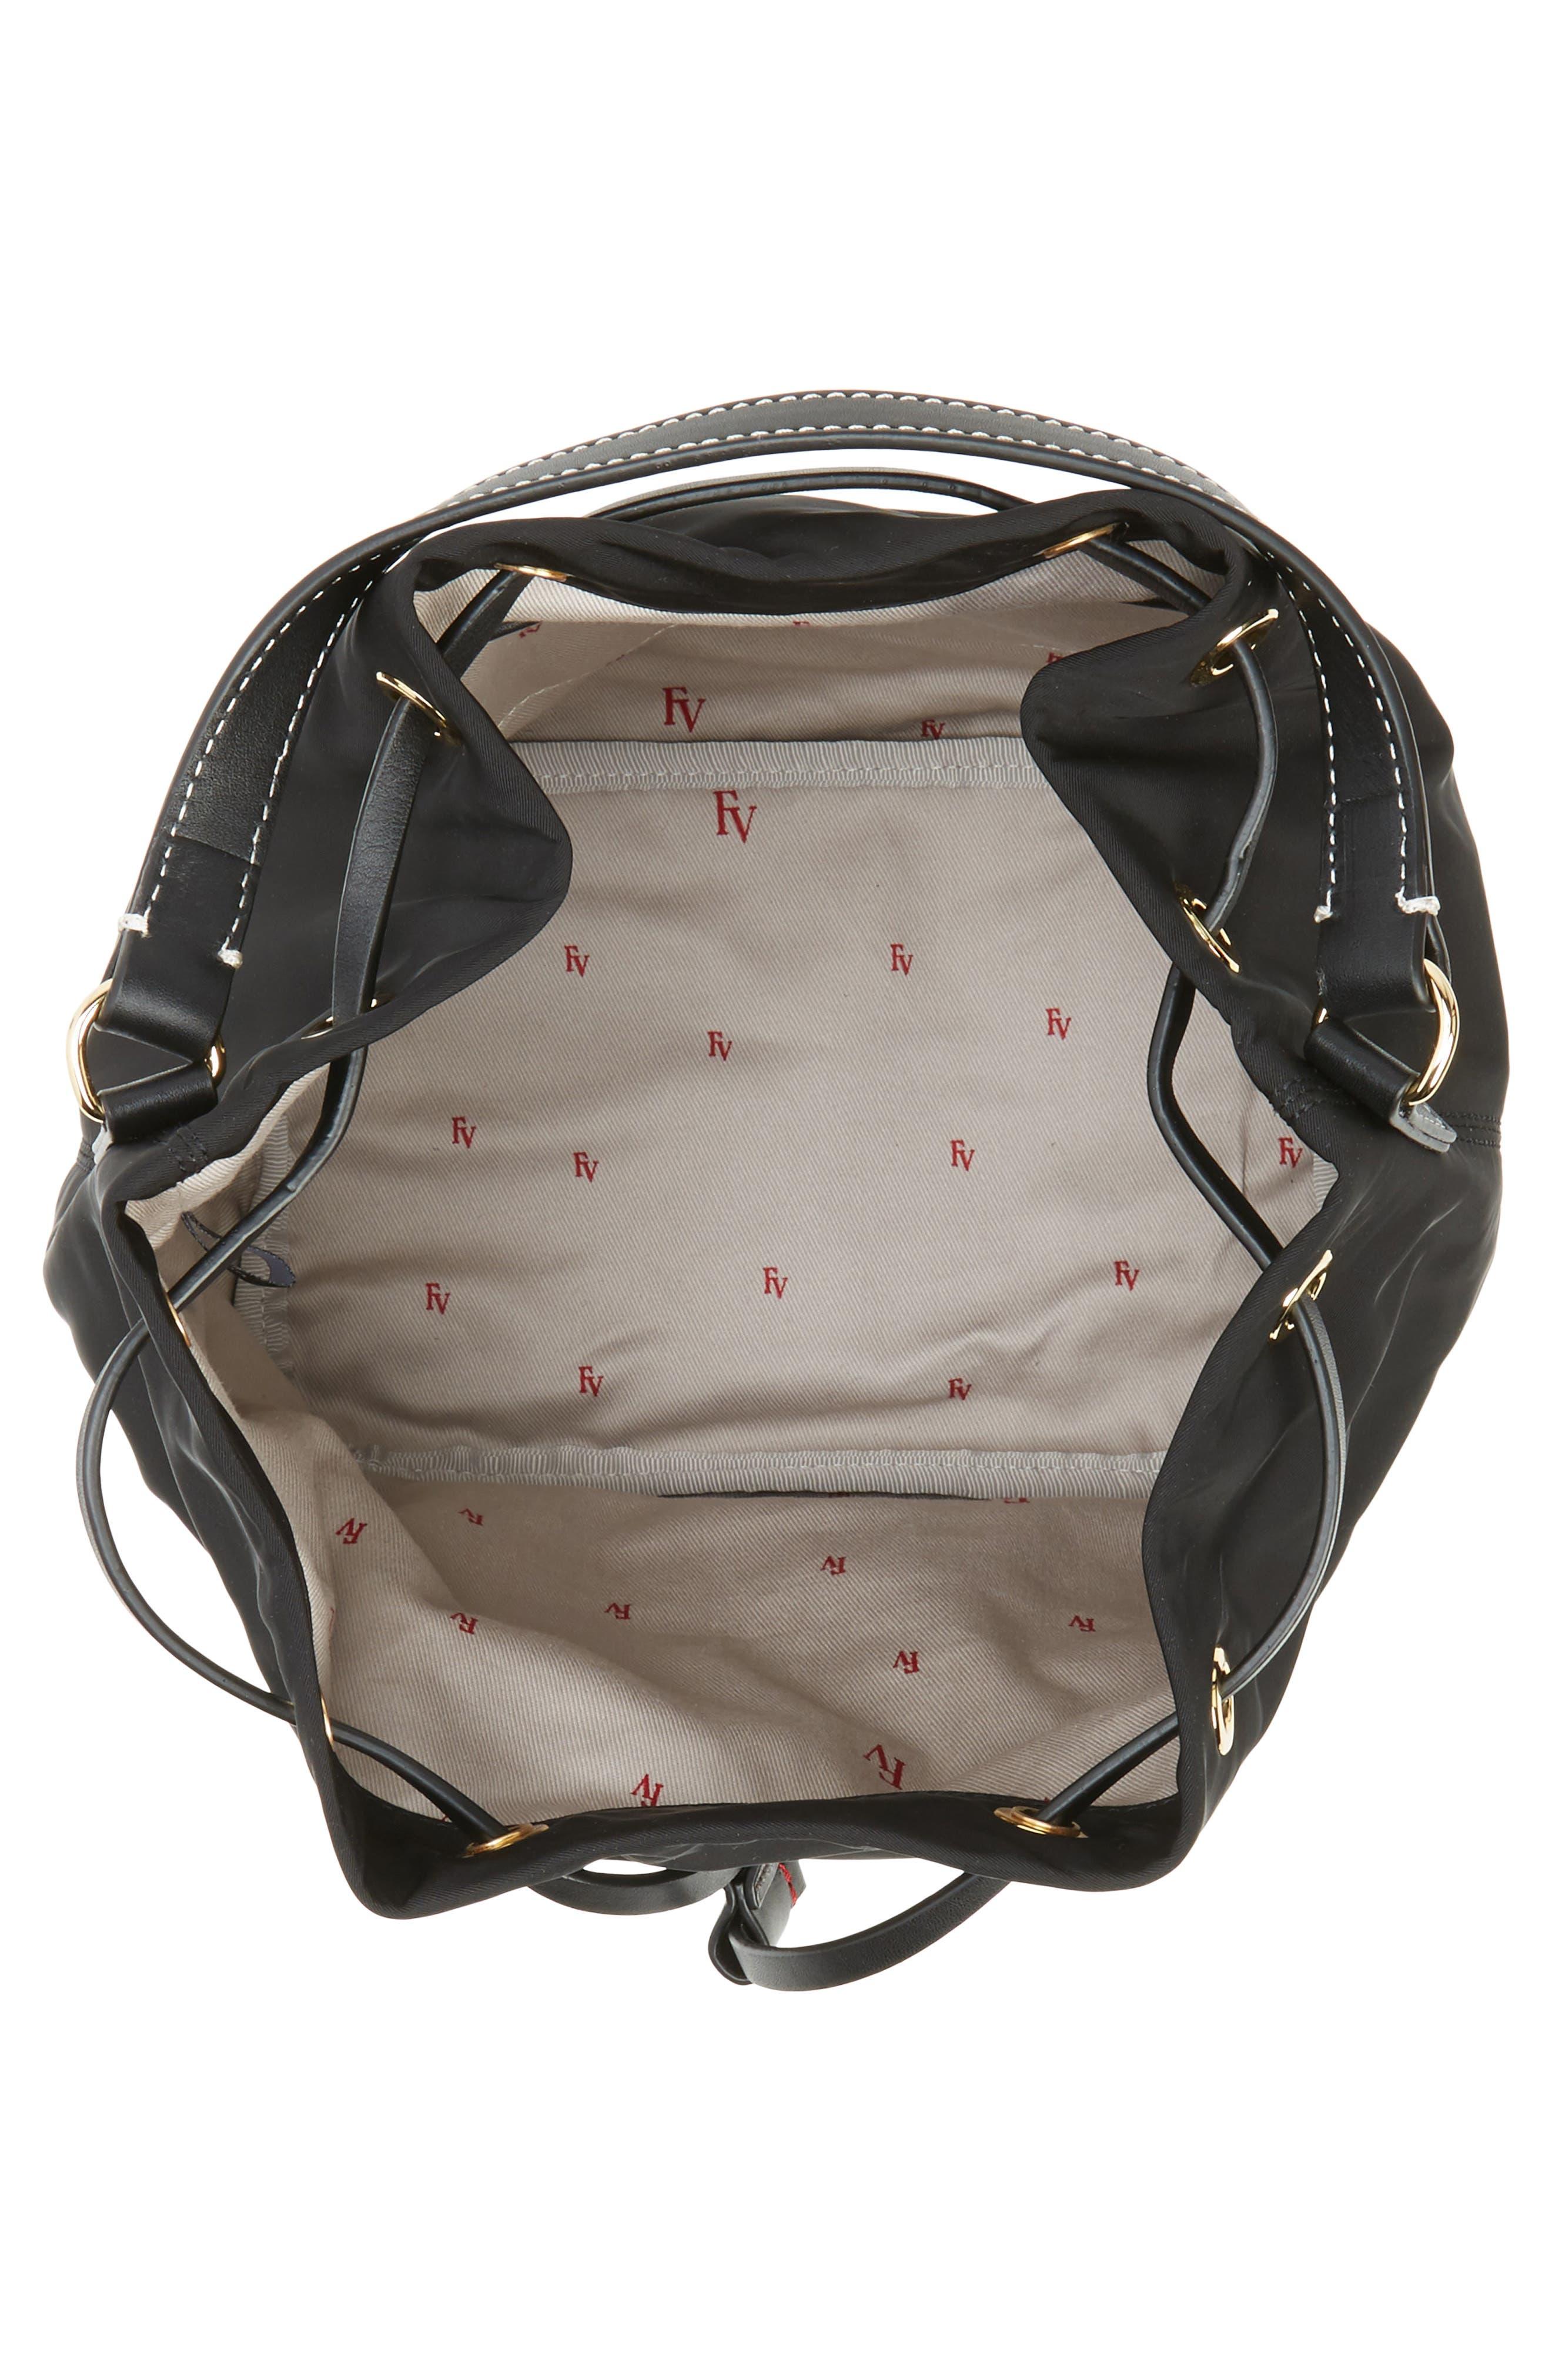 Medium Ann Nylon Bucket Bag,                             Alternate thumbnail 4, color,                             001